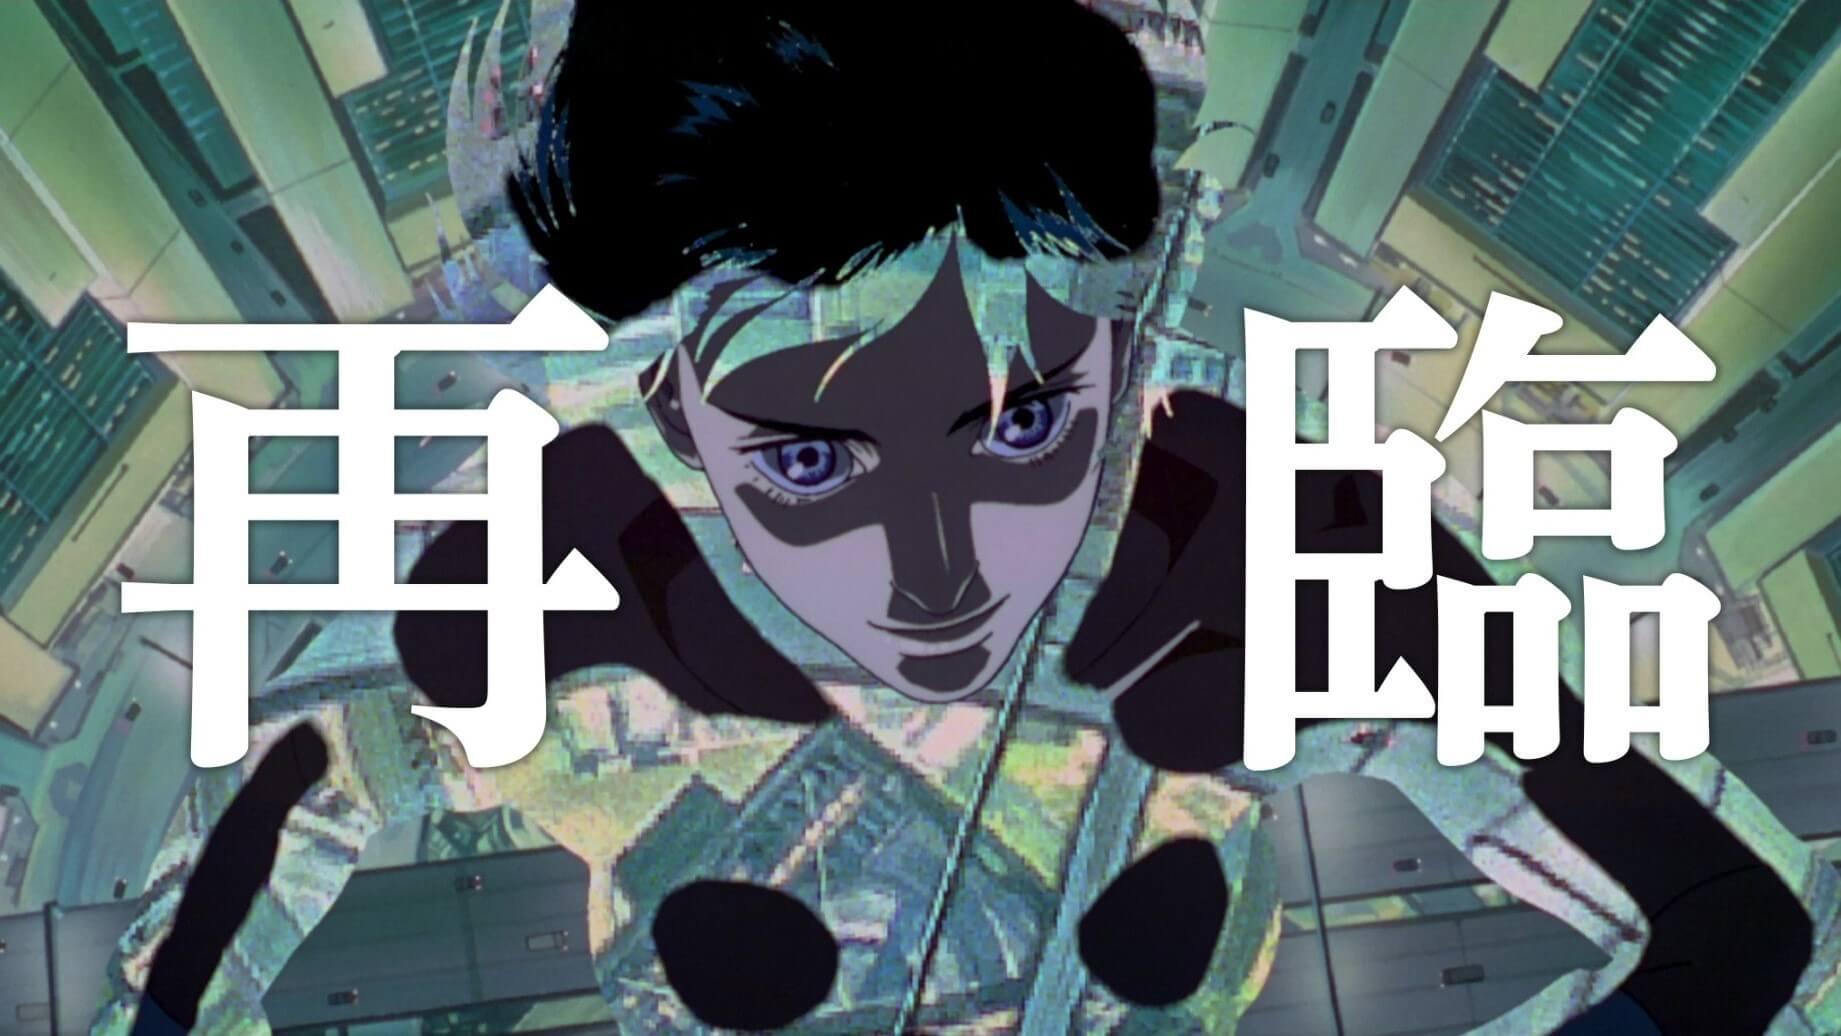 『GHOST IN THE SHELL/攻殻機動隊 4Kリマスター版』IMAX 9.17公開